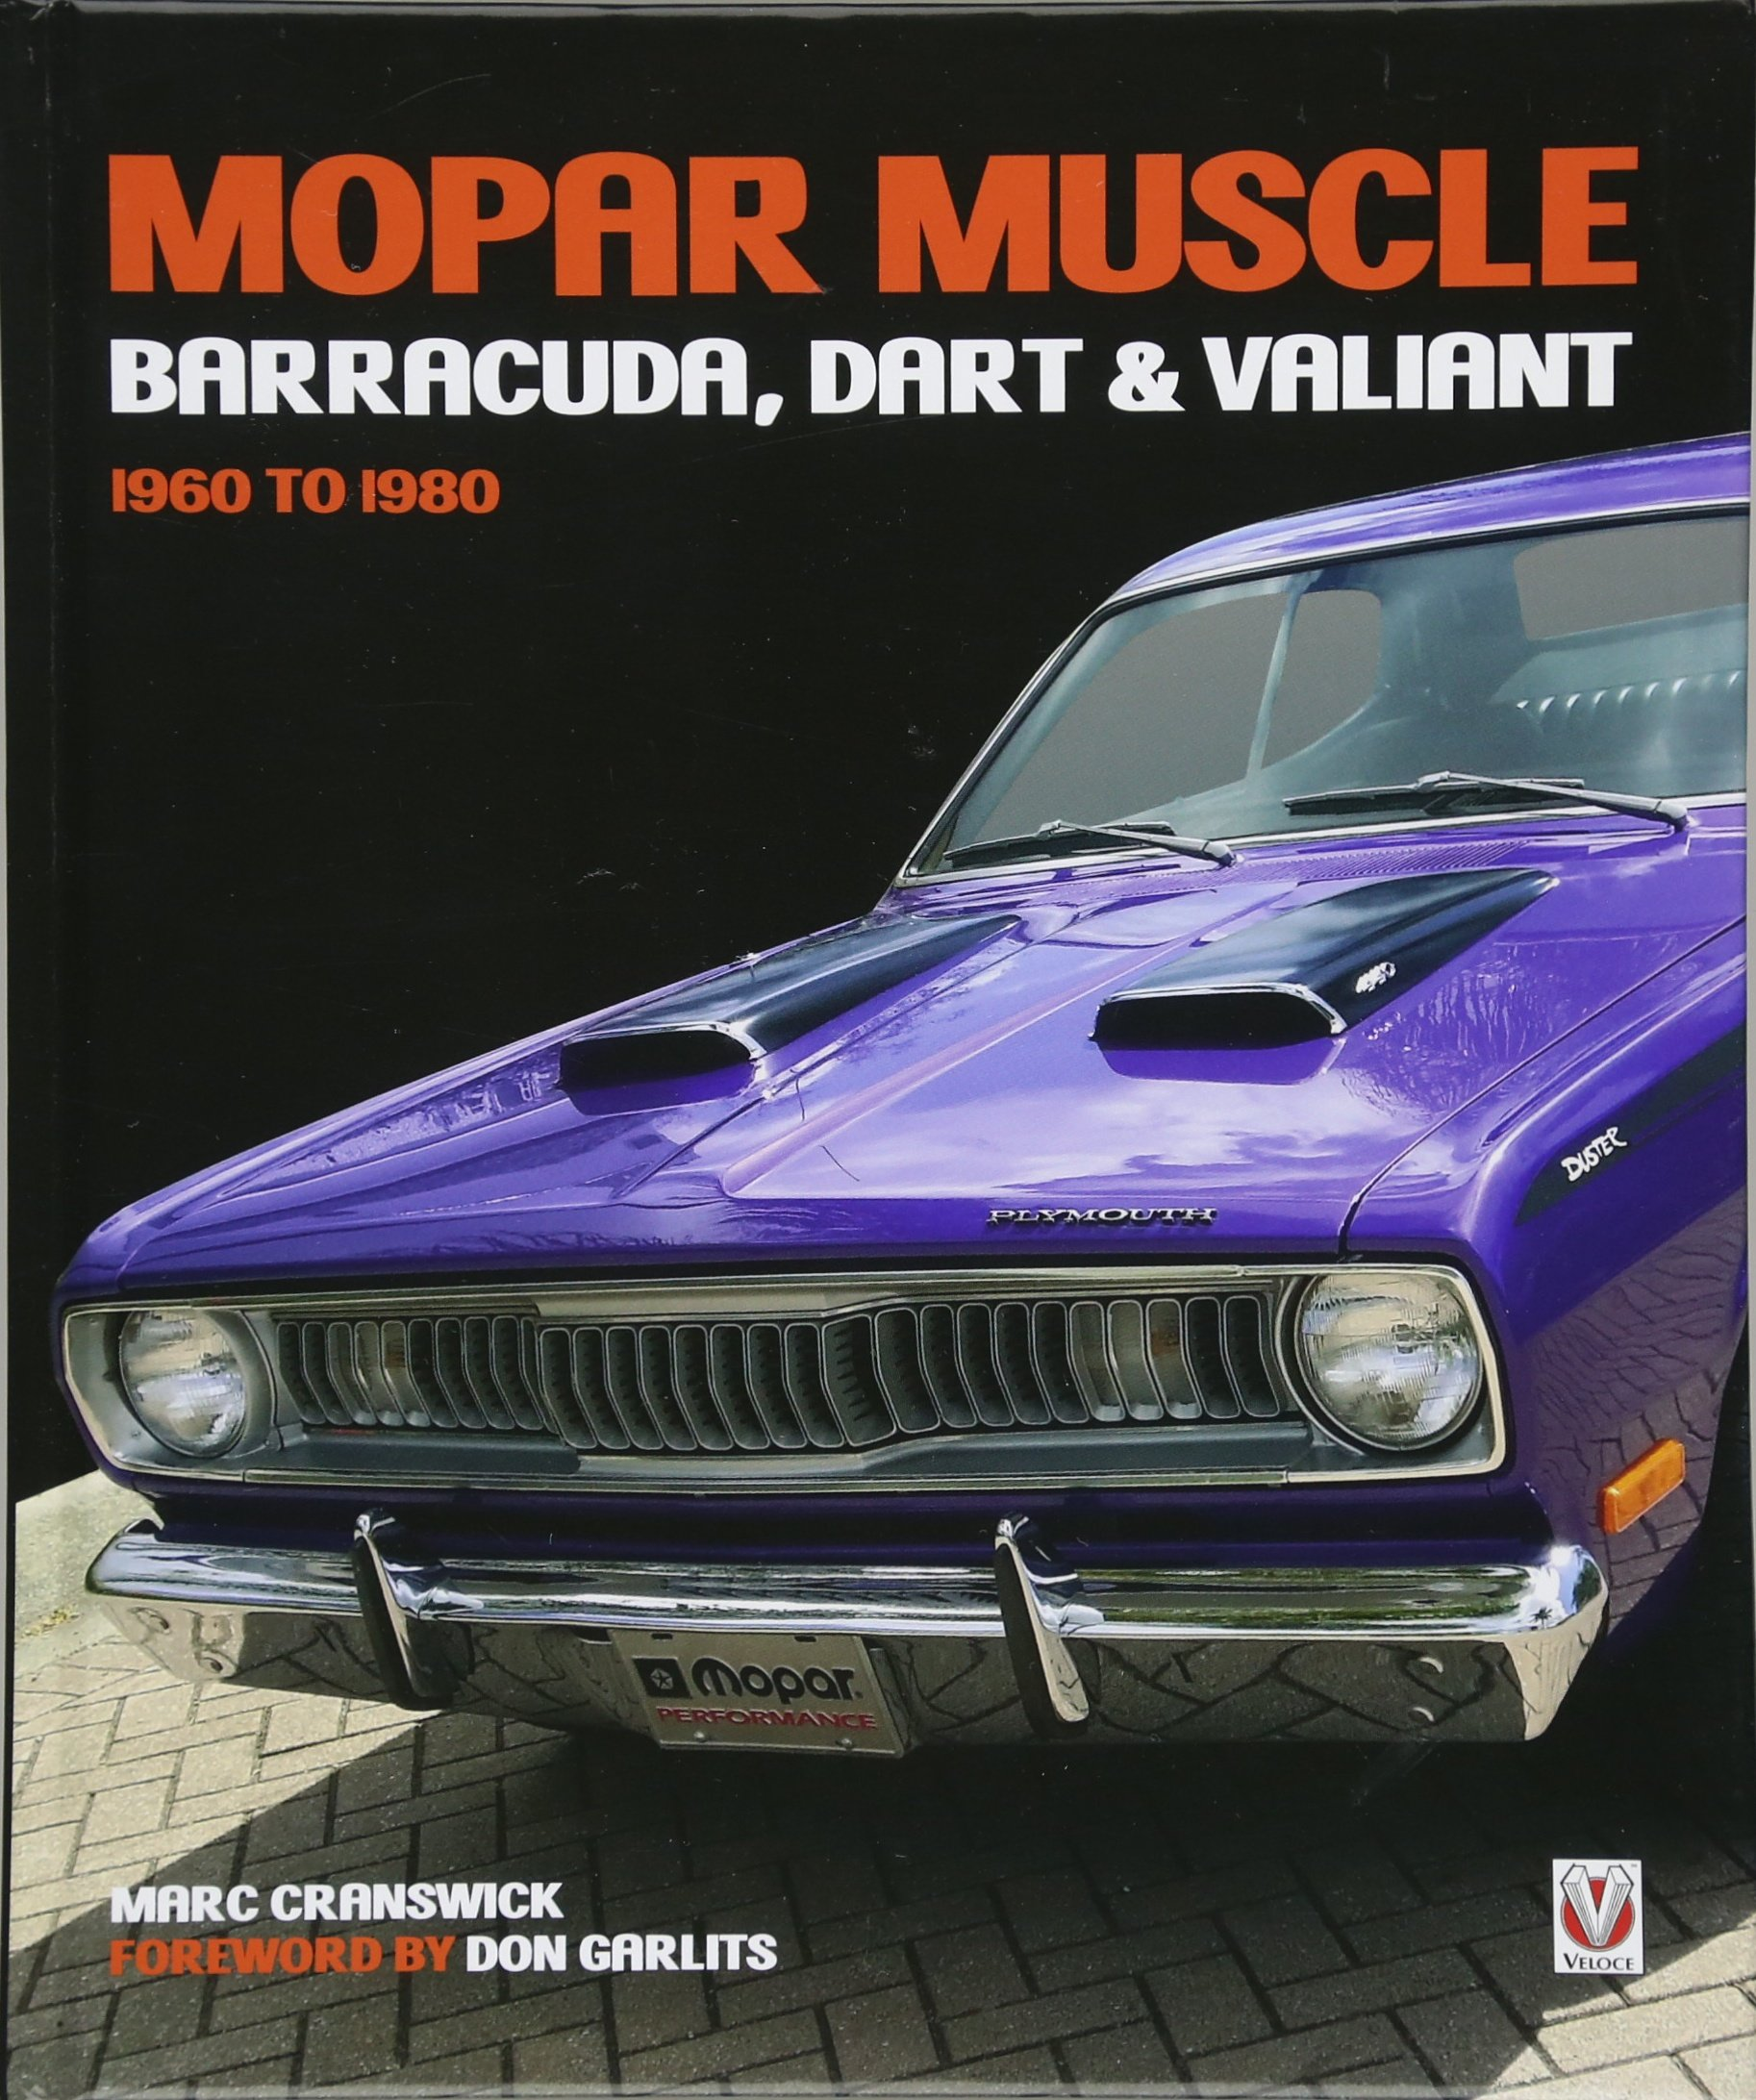 MOPAR Muscle - Barracuda, Dart & Valiant 1960-1980: Marc Cranswick, Don  Garlits: 9781787110717: Amazon.com: Books